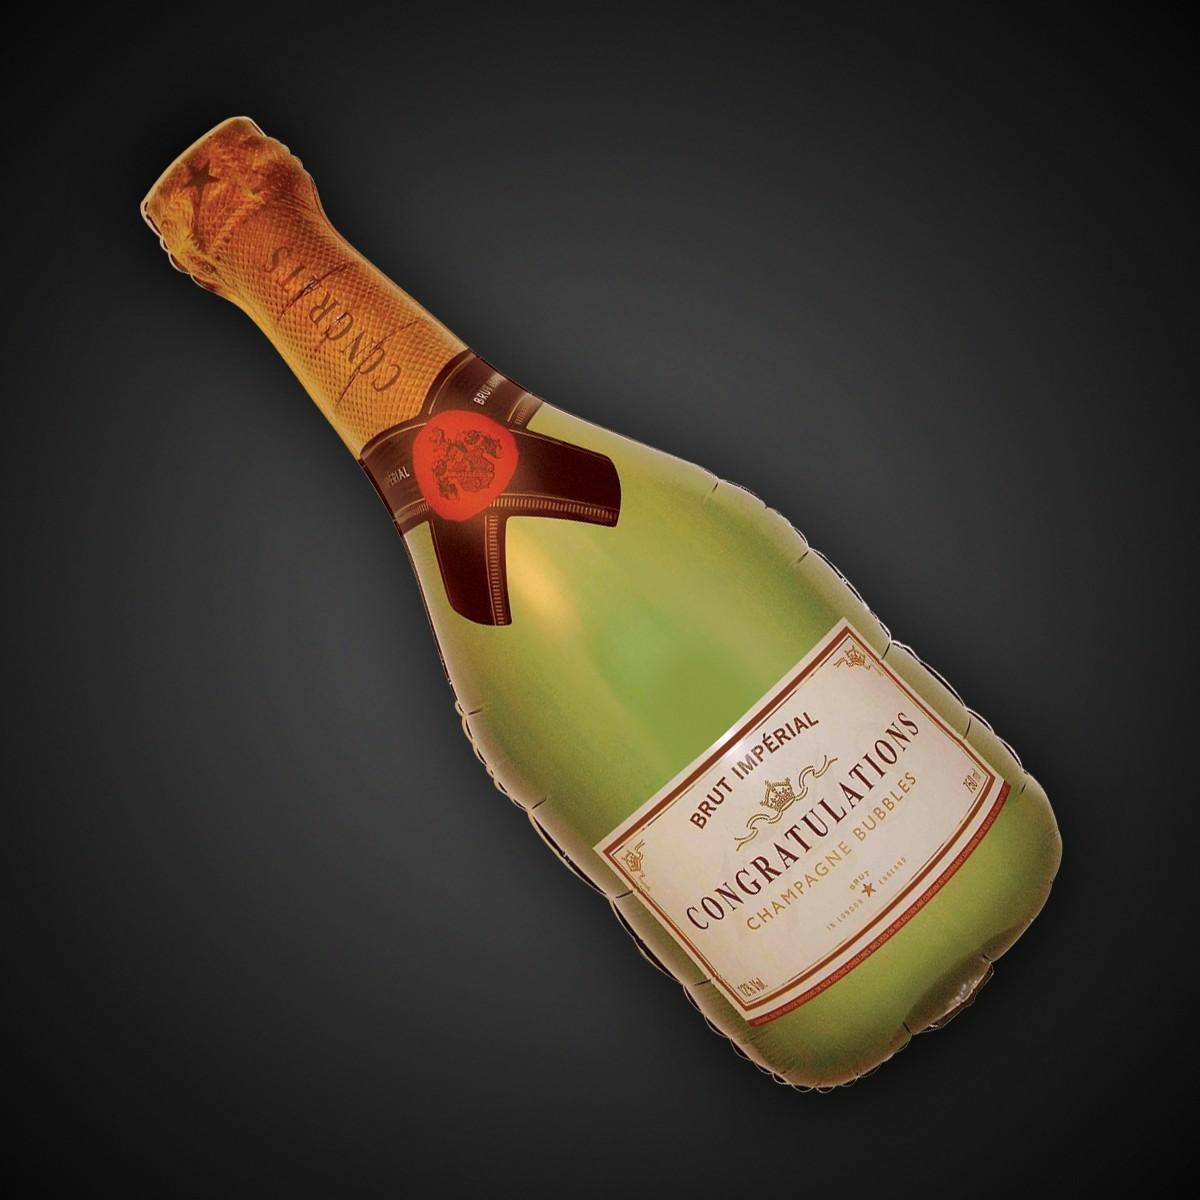 Champagne Bottle Metallic Balloon - 36 Inch